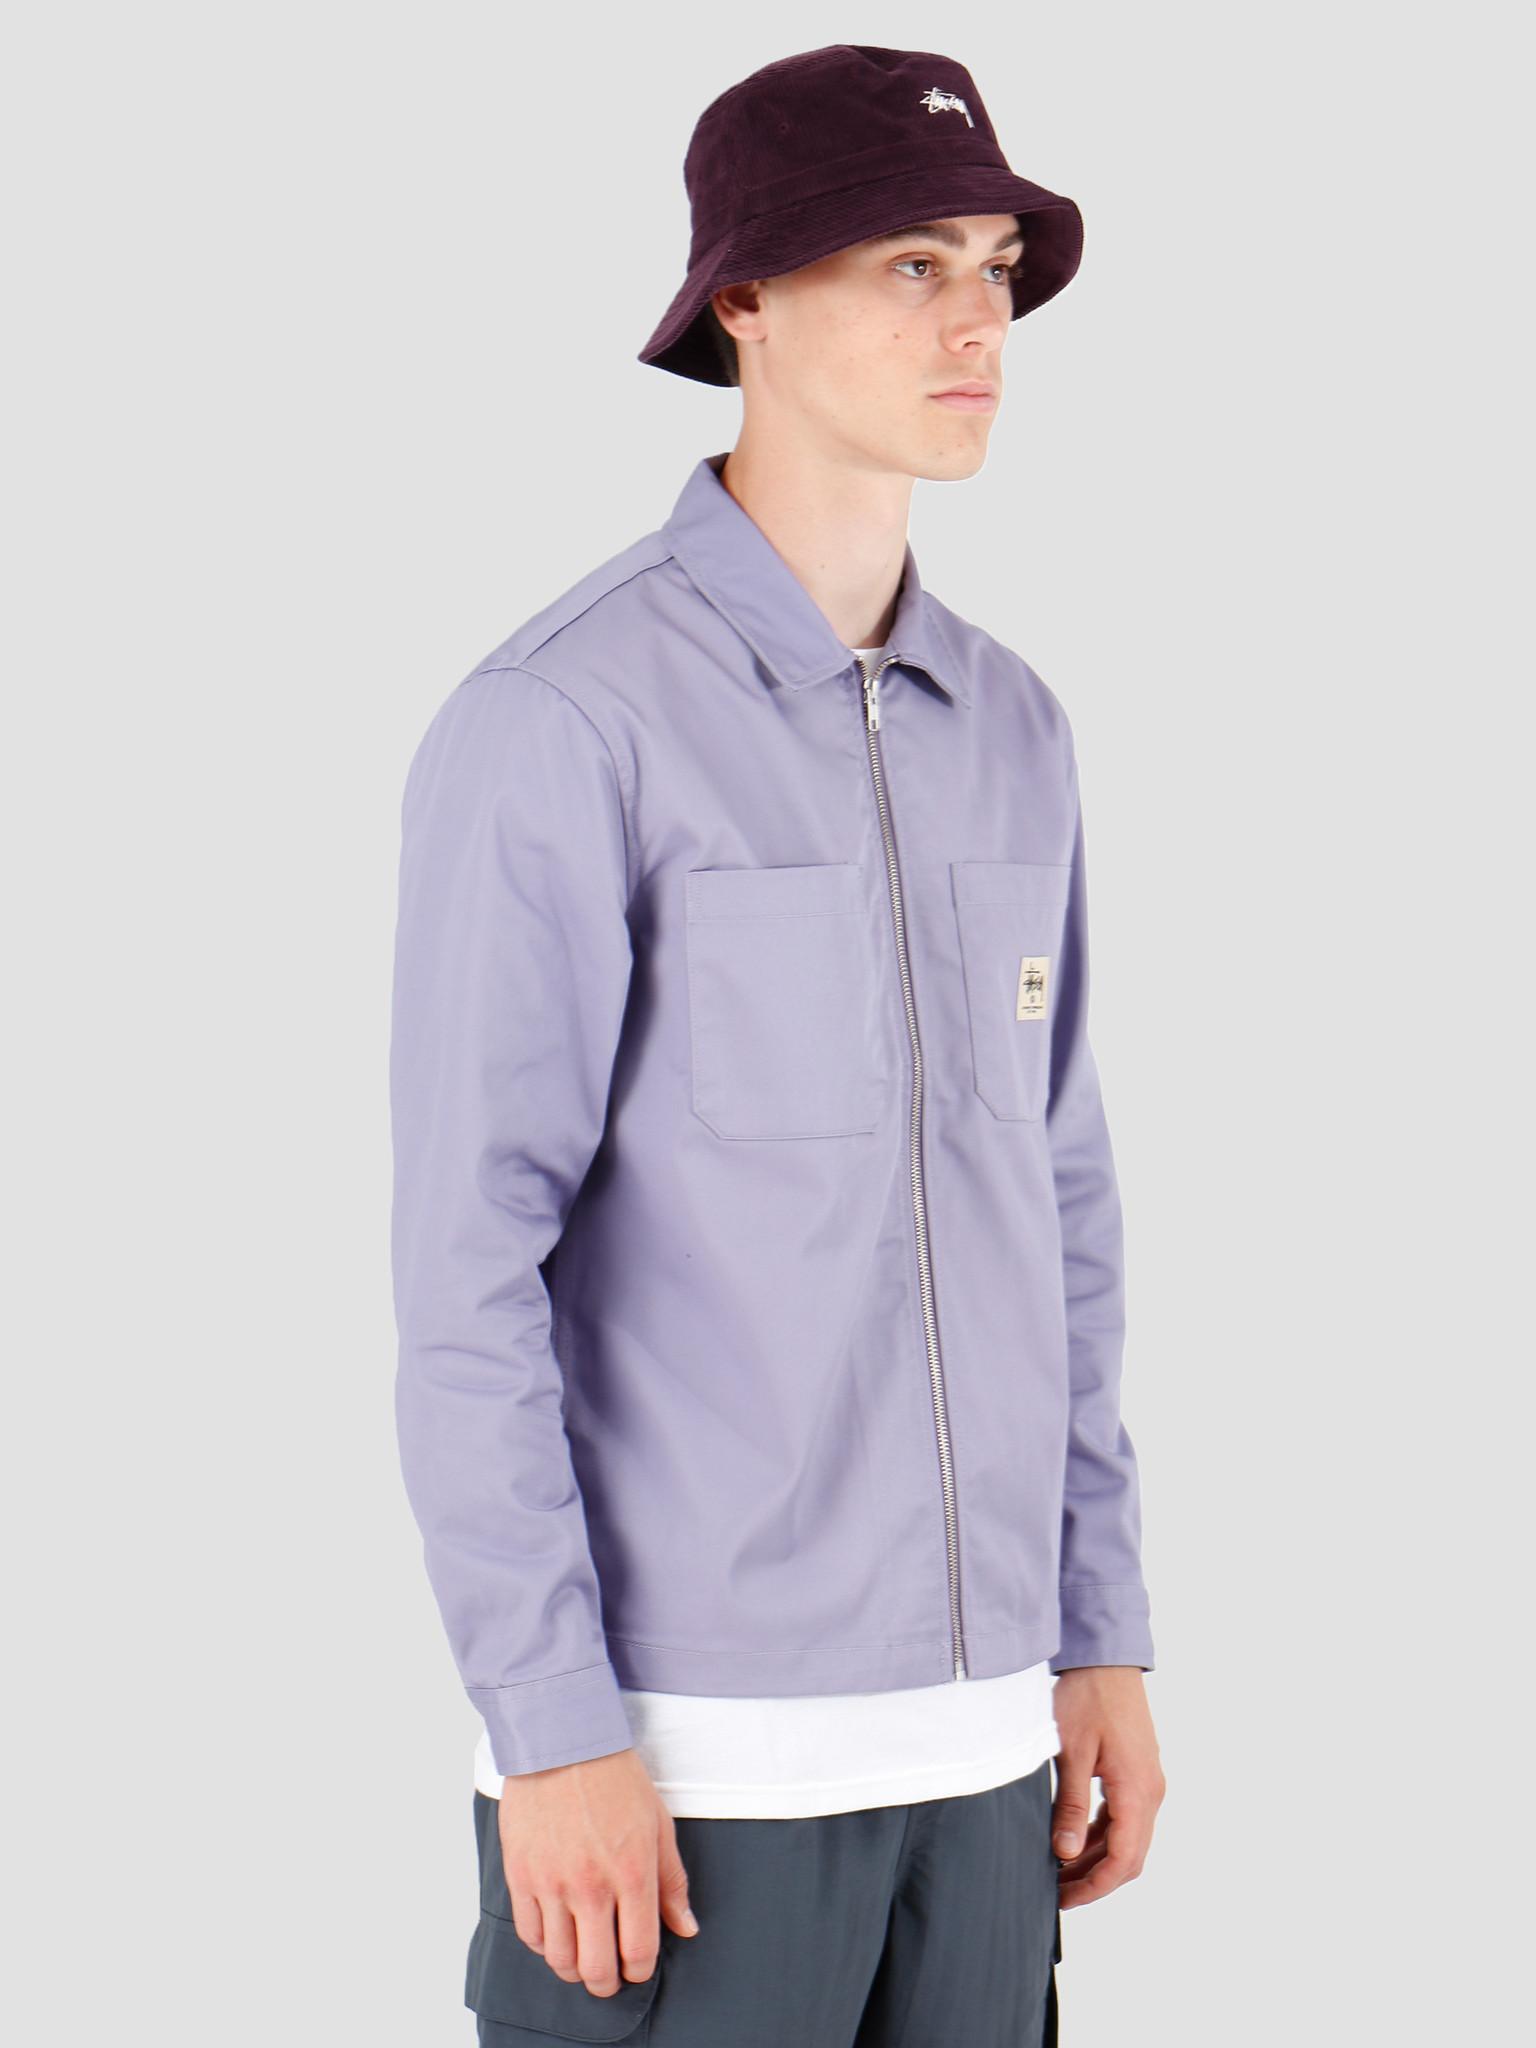 Stussy Stussy Zip Up Work Longsleeve Shirt Lavendar 1110065